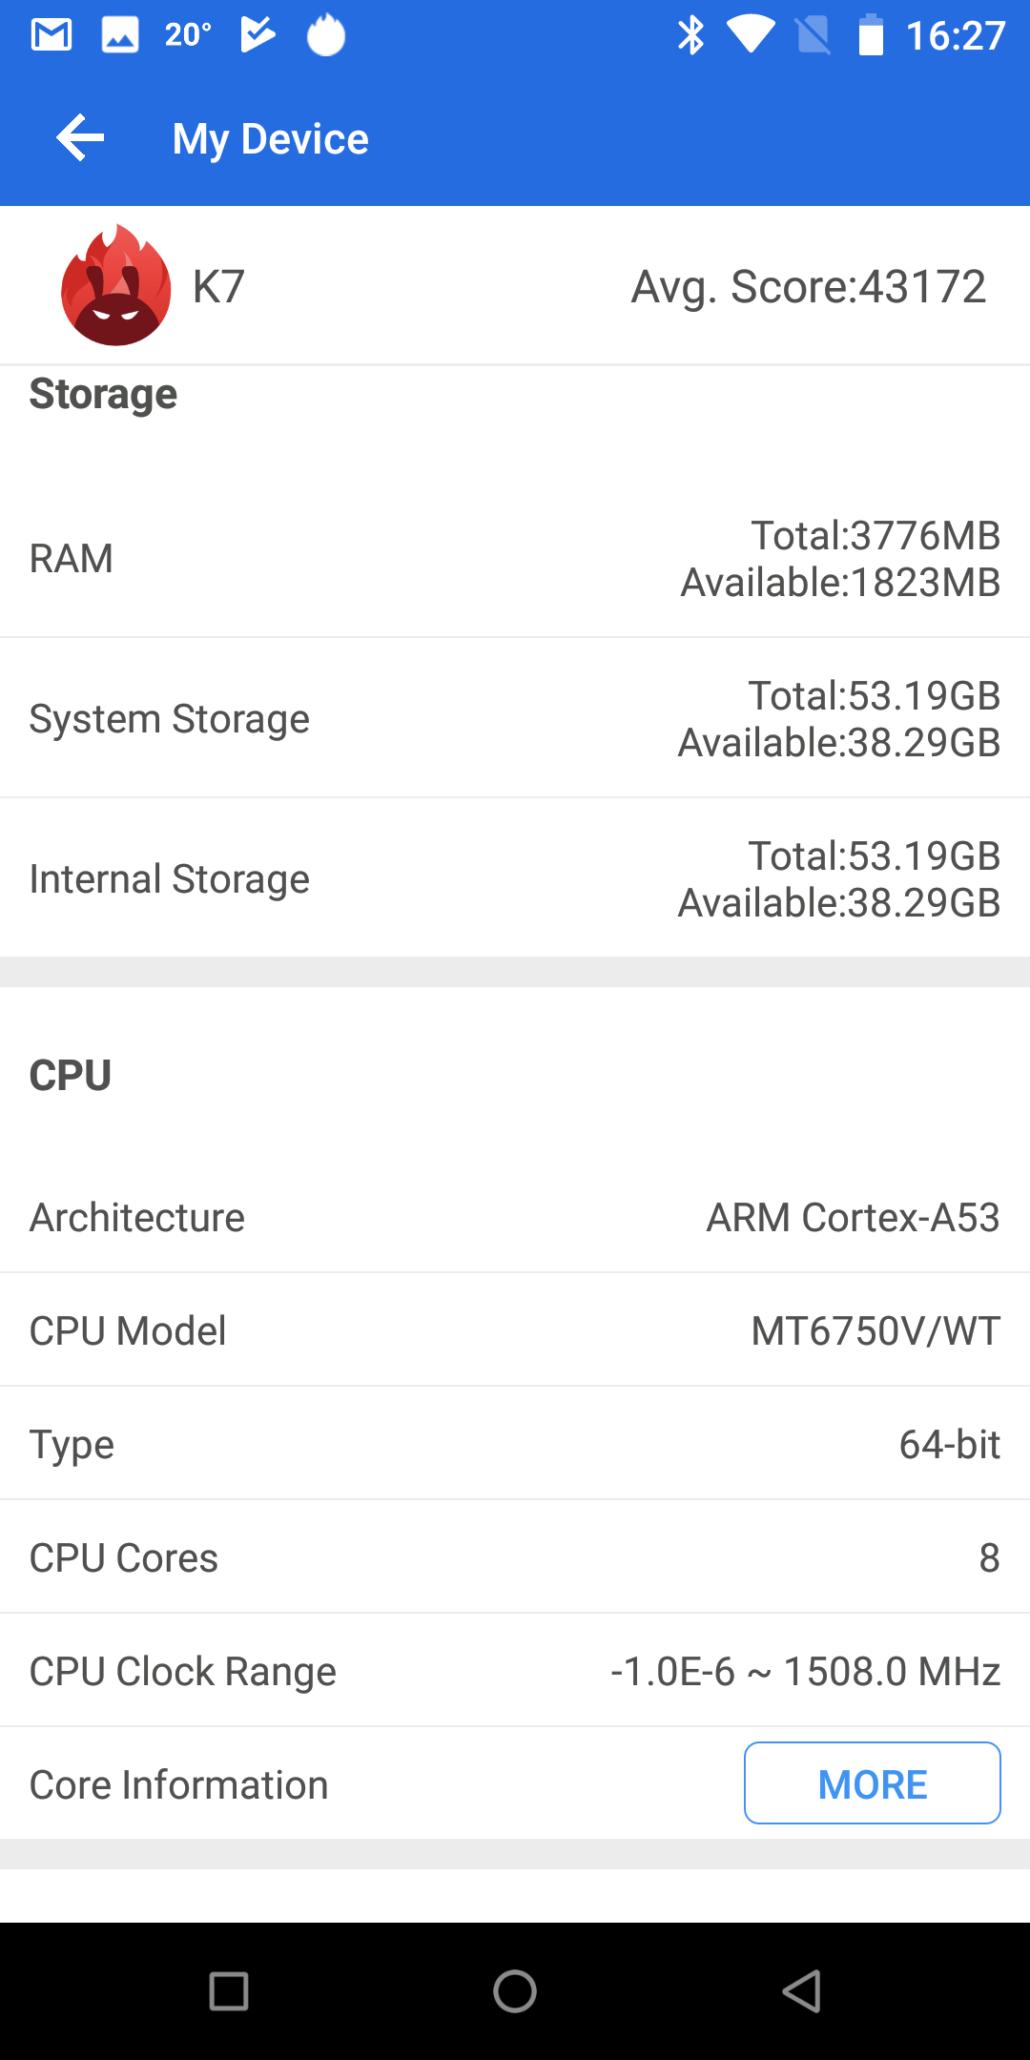 oukitel-k7-phone-review-05-part-4-antutu-storage-cpu